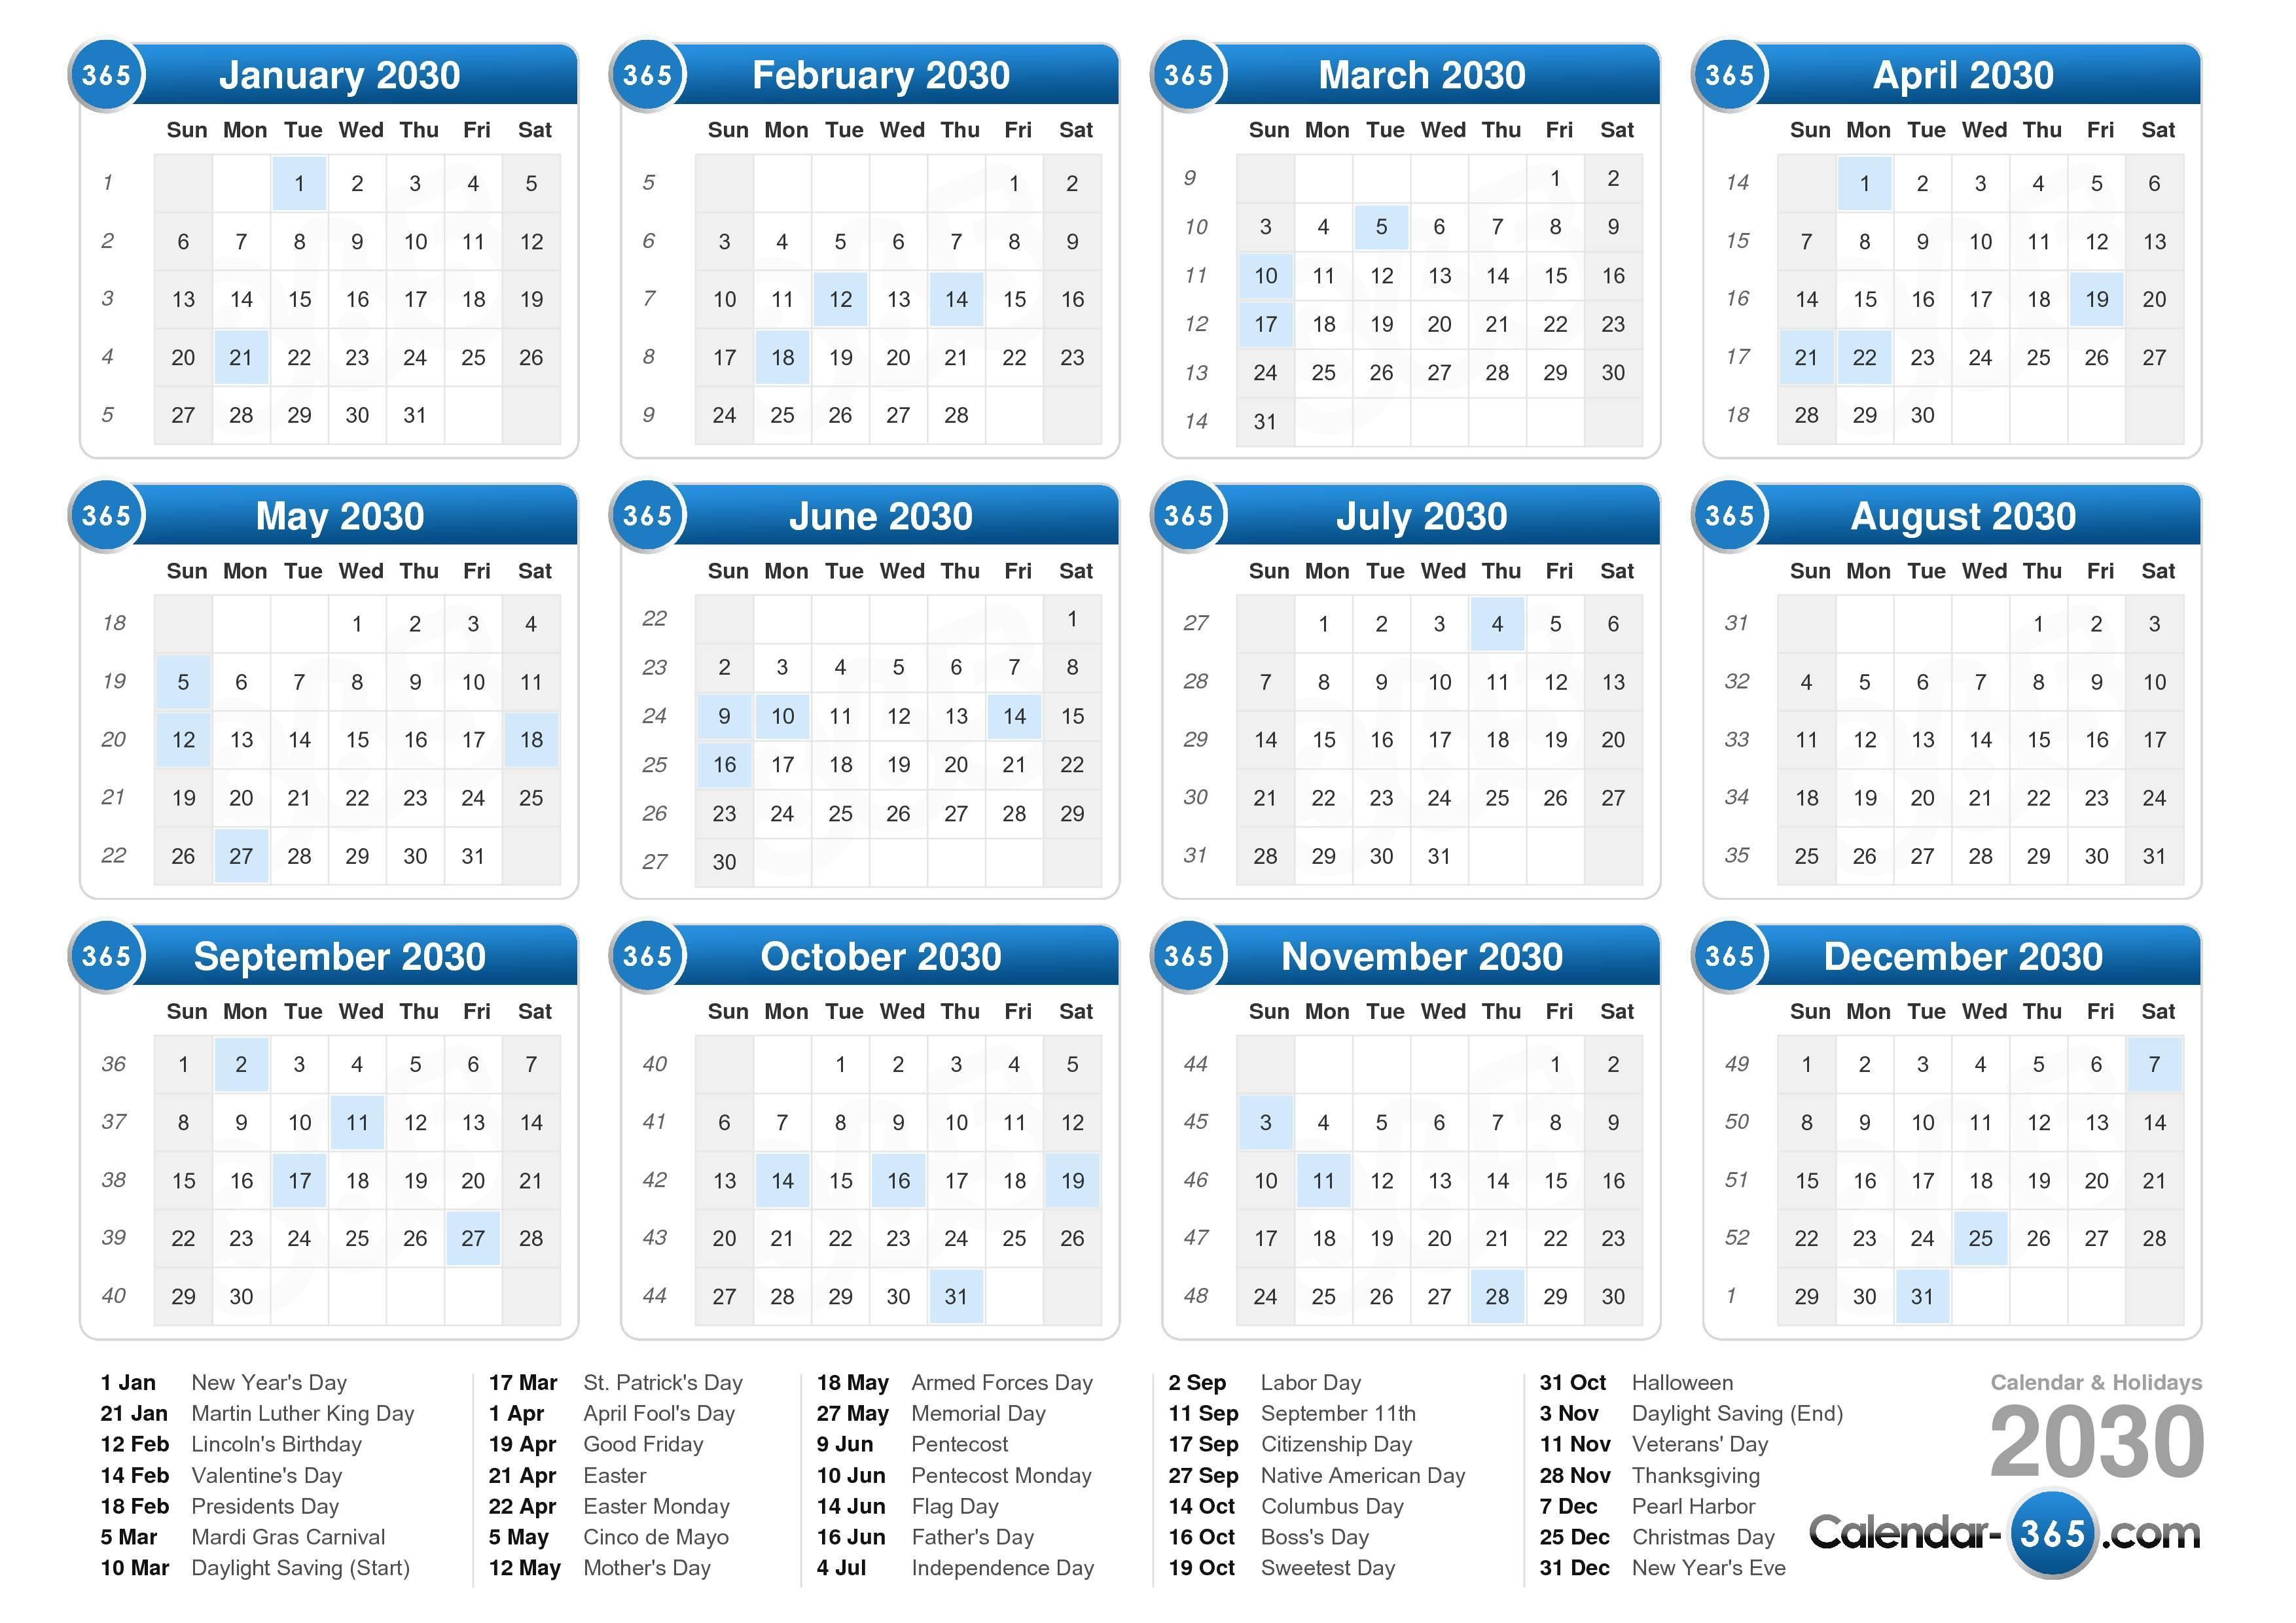 ... calendar with holidays landscape format 1 page 2030 calendar 736 5 075